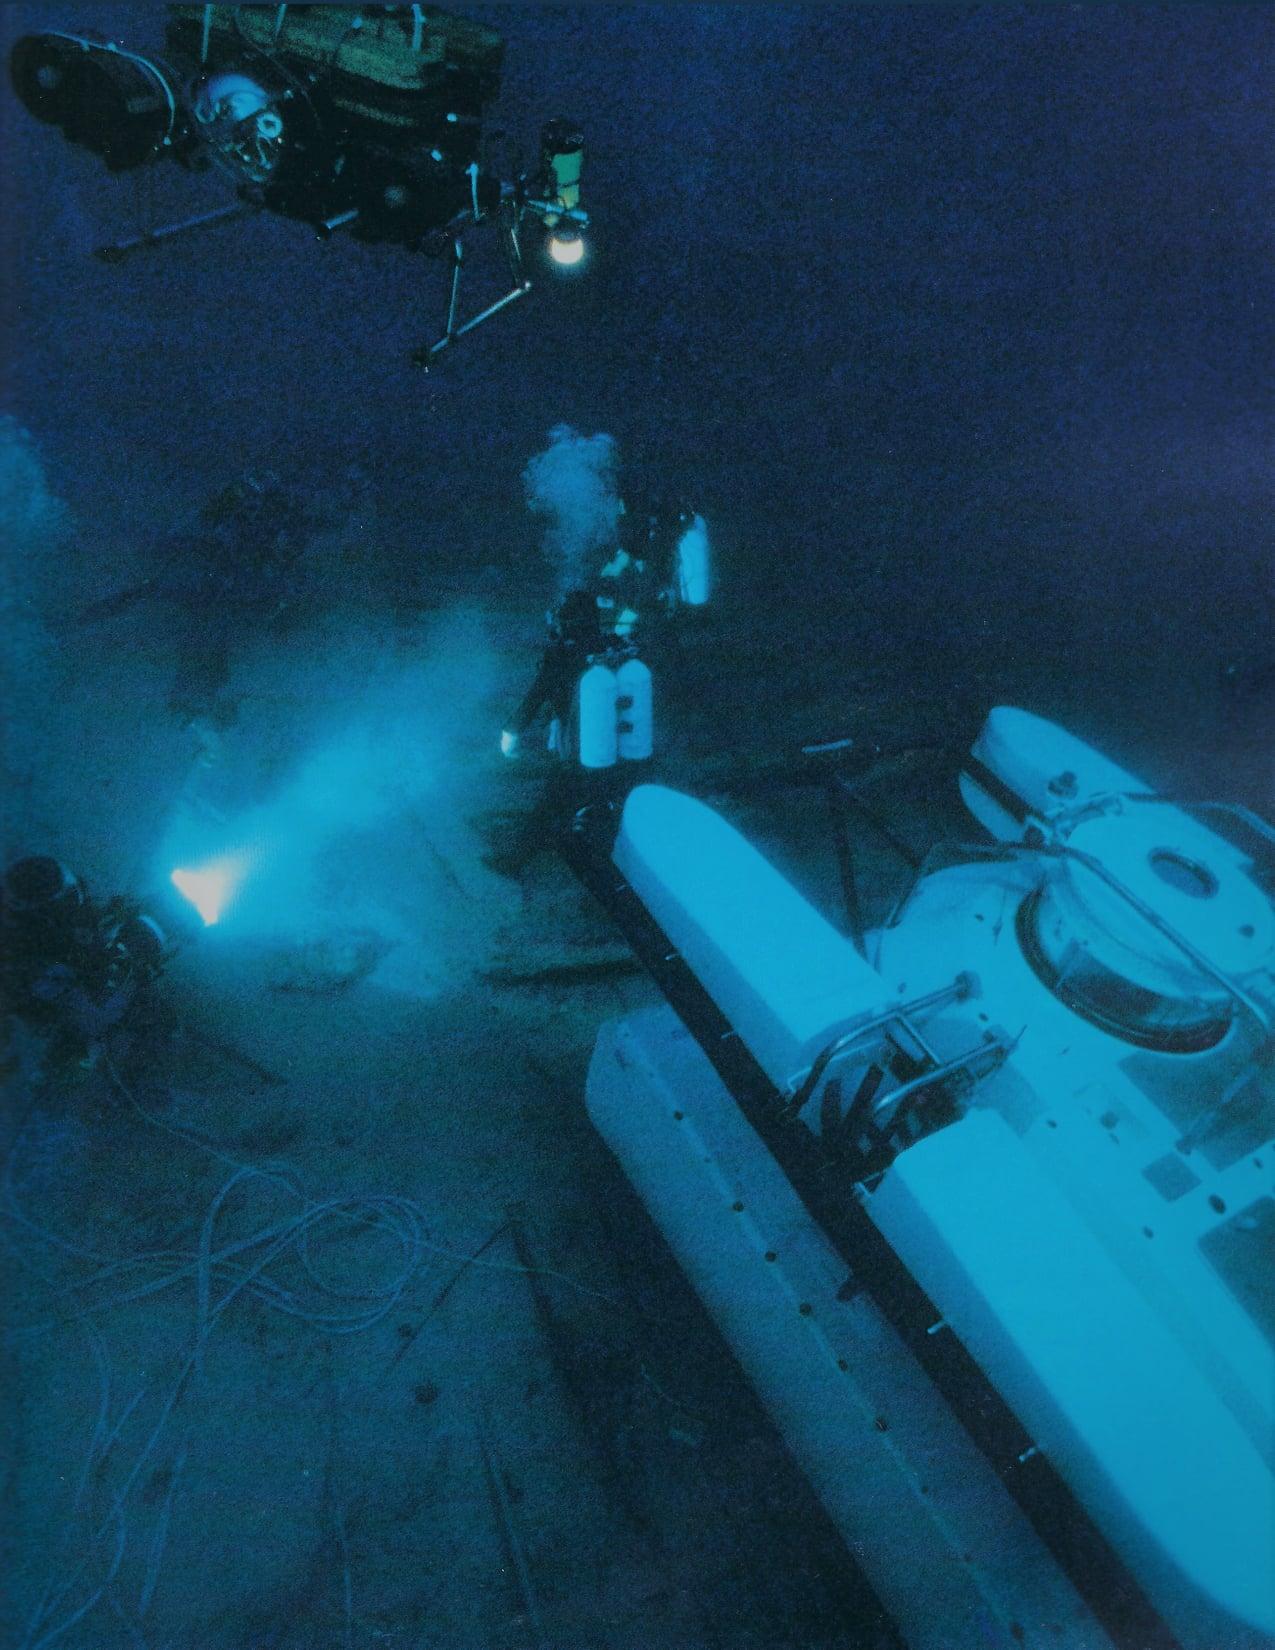 San Diego Shipwreck Near Fortune Island in Batangas, Philippines